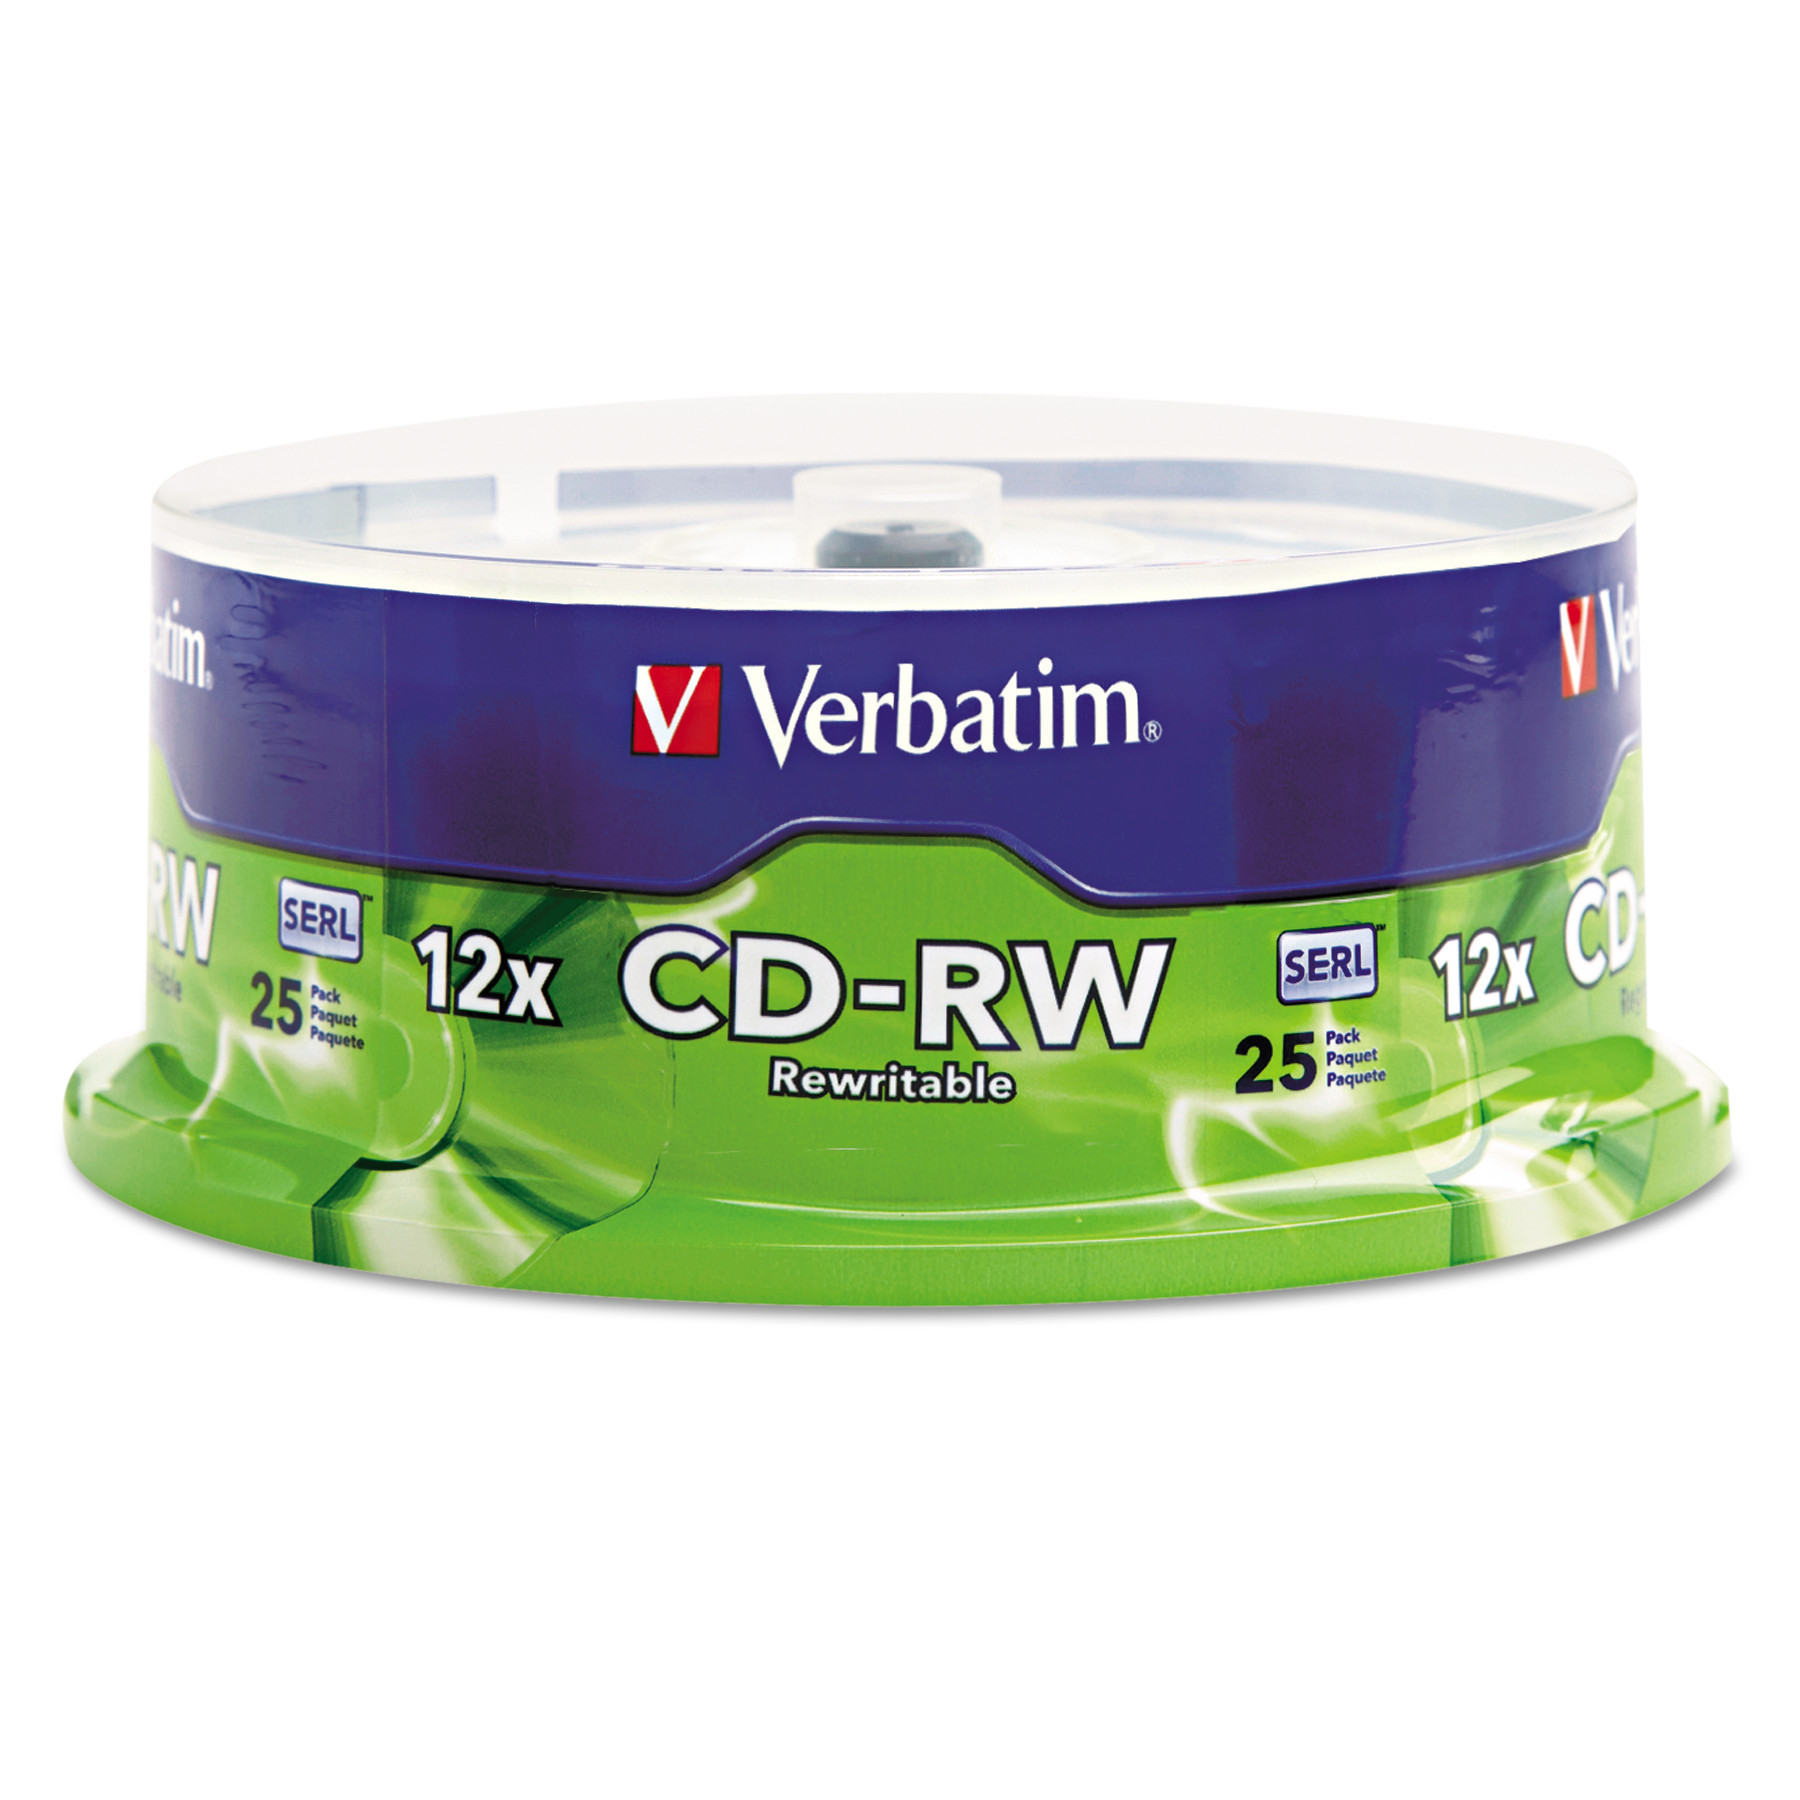 Verbatim CD-RW Discs, 700MB/80min, 4X/12X, Spindle, 25/Pk -VER95155